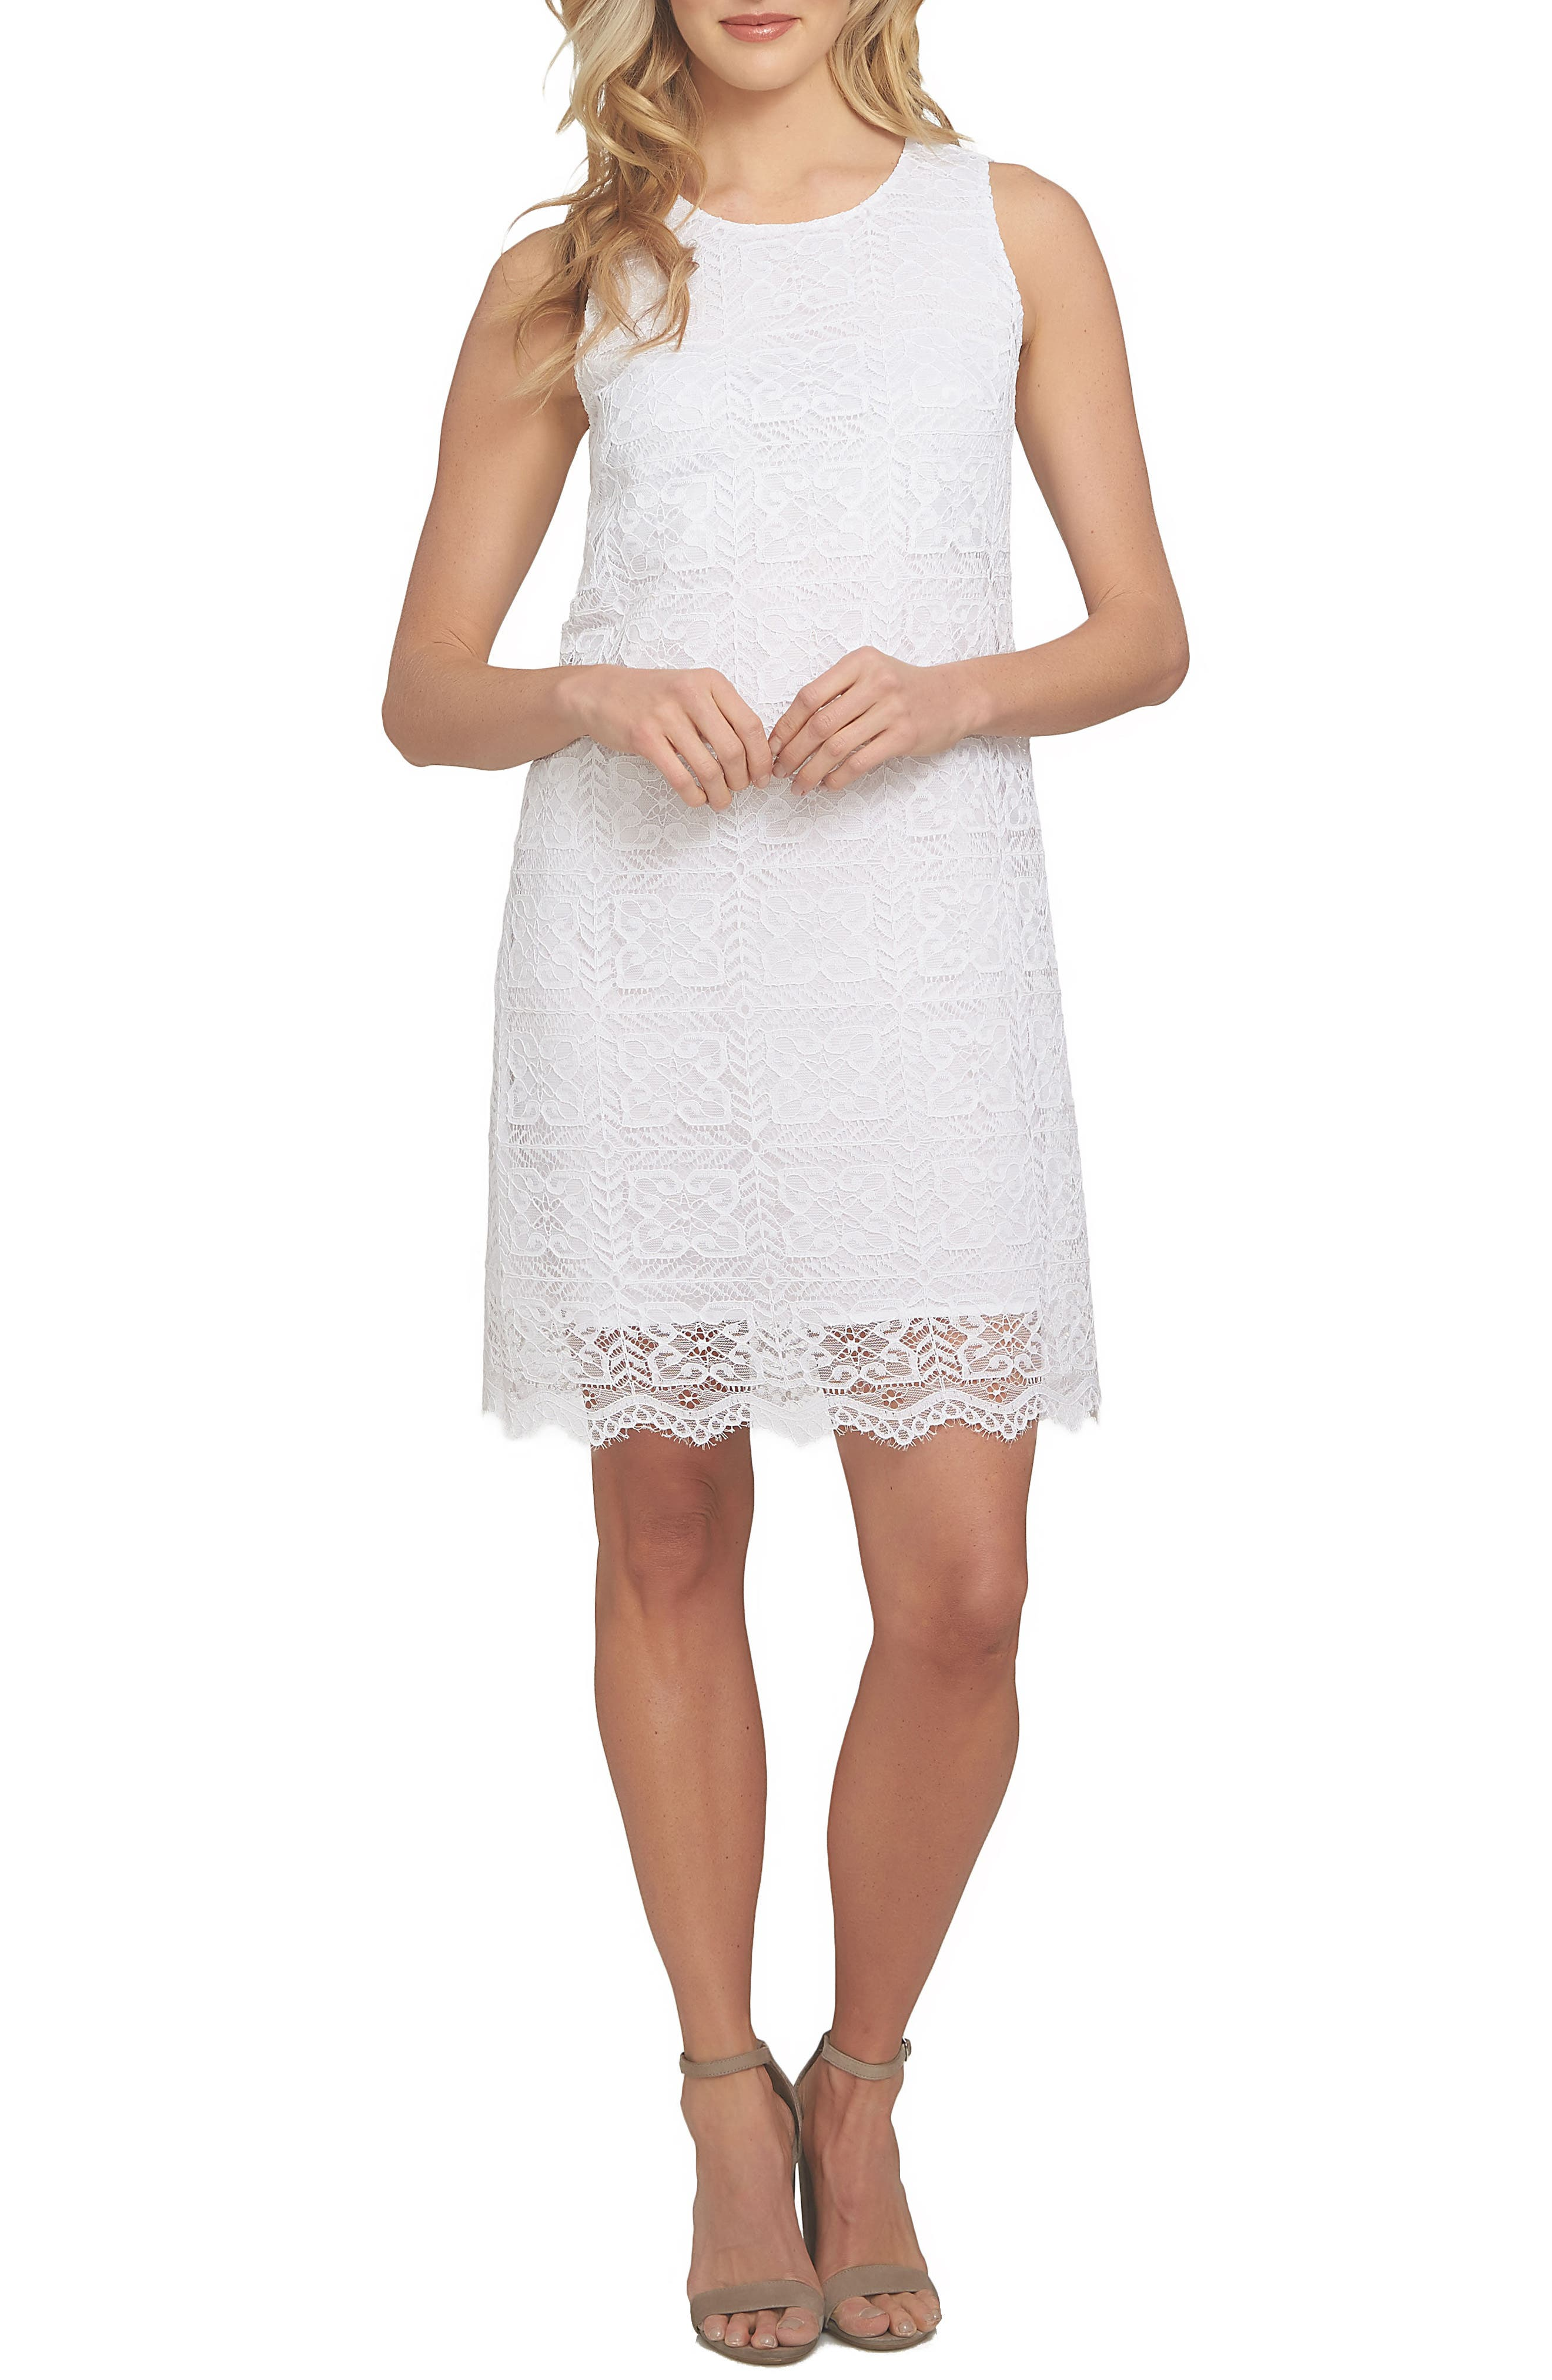 CeCe Arlington A-Line Dress